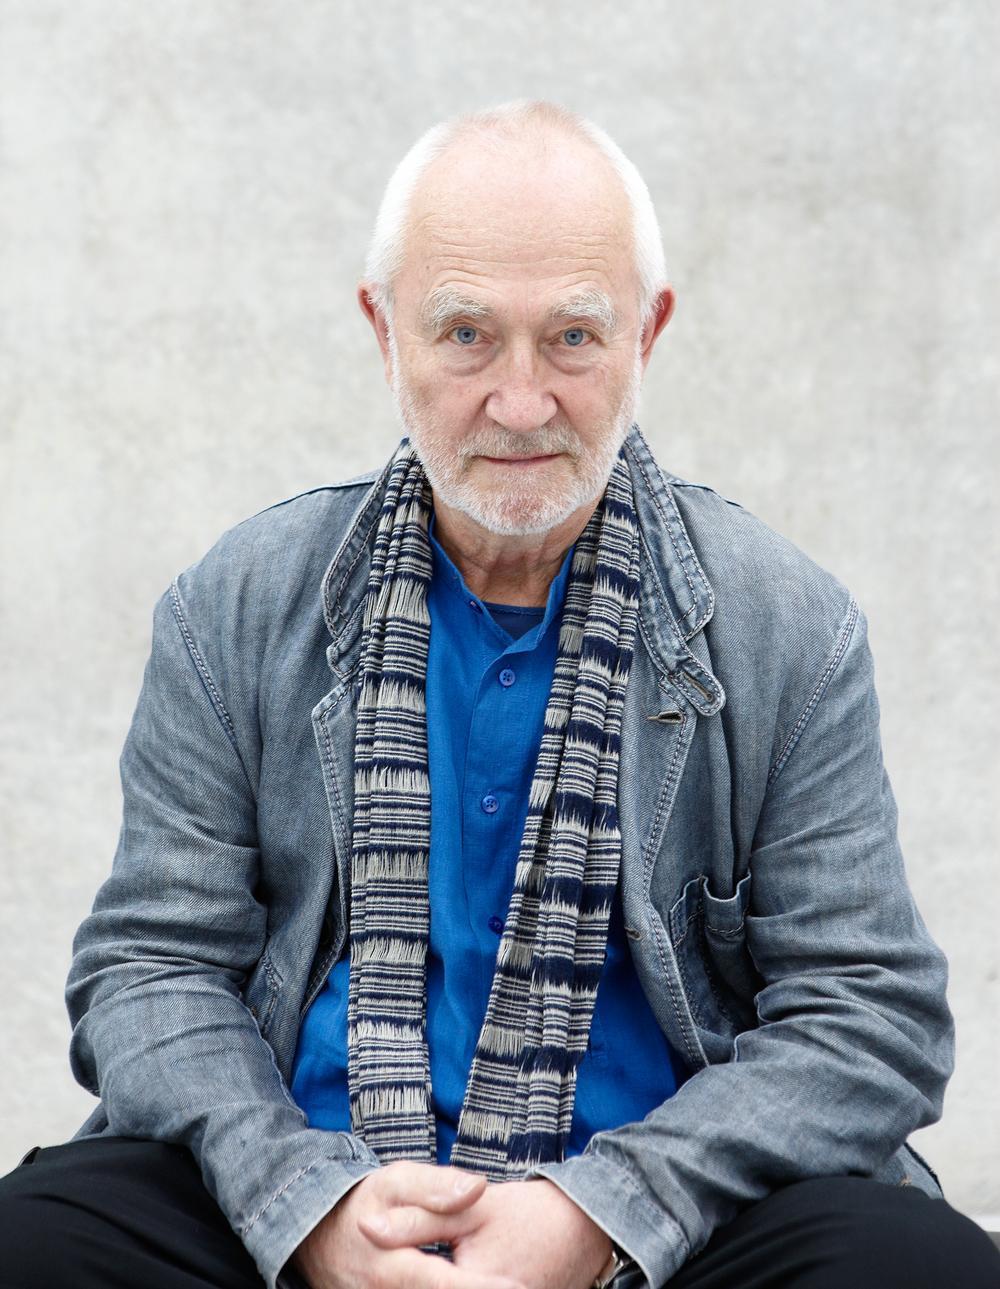 Peter Zumthor studied in Basel, Switzerland and New York. He launched his practice in Haldenstein in 1979 / Martin Mischkulnig, courtesy of Peter Zumthor/Part